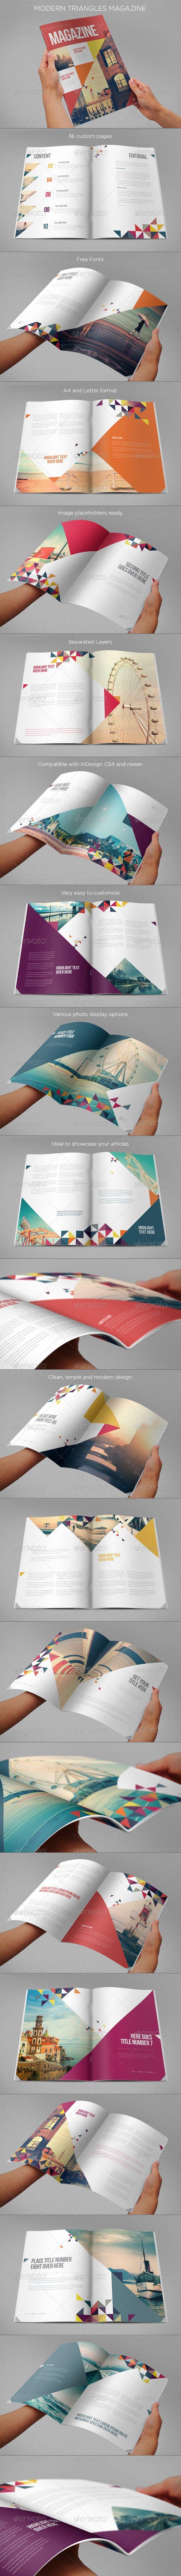 Modern Triangles Magazine - Magazines Print Templates — Designspiration